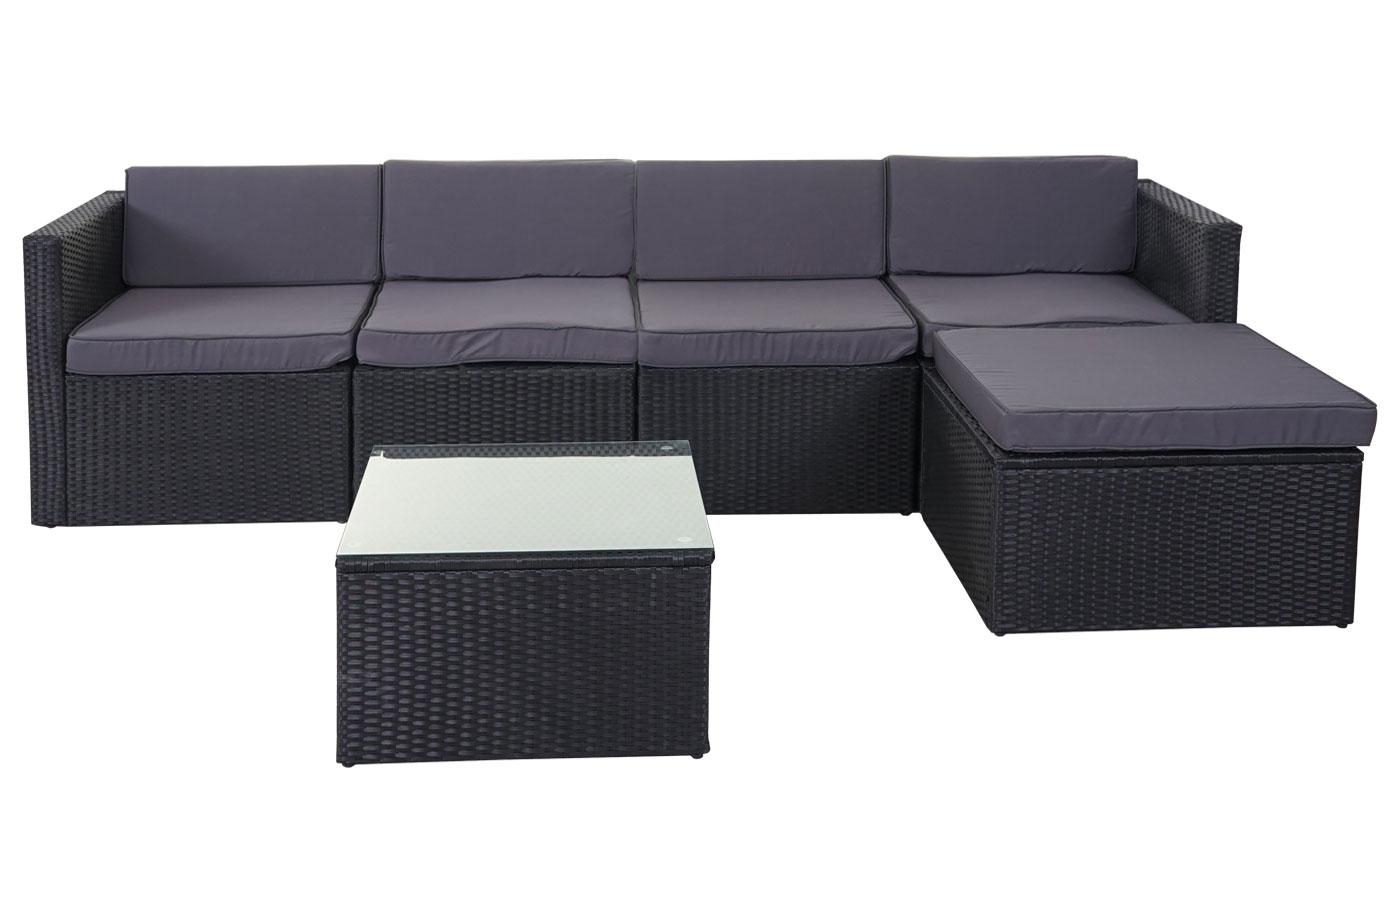 rattan lounge sunshine ii garten sitzgruppe grau polster. Black Bedroom Furniture Sets. Home Design Ideas